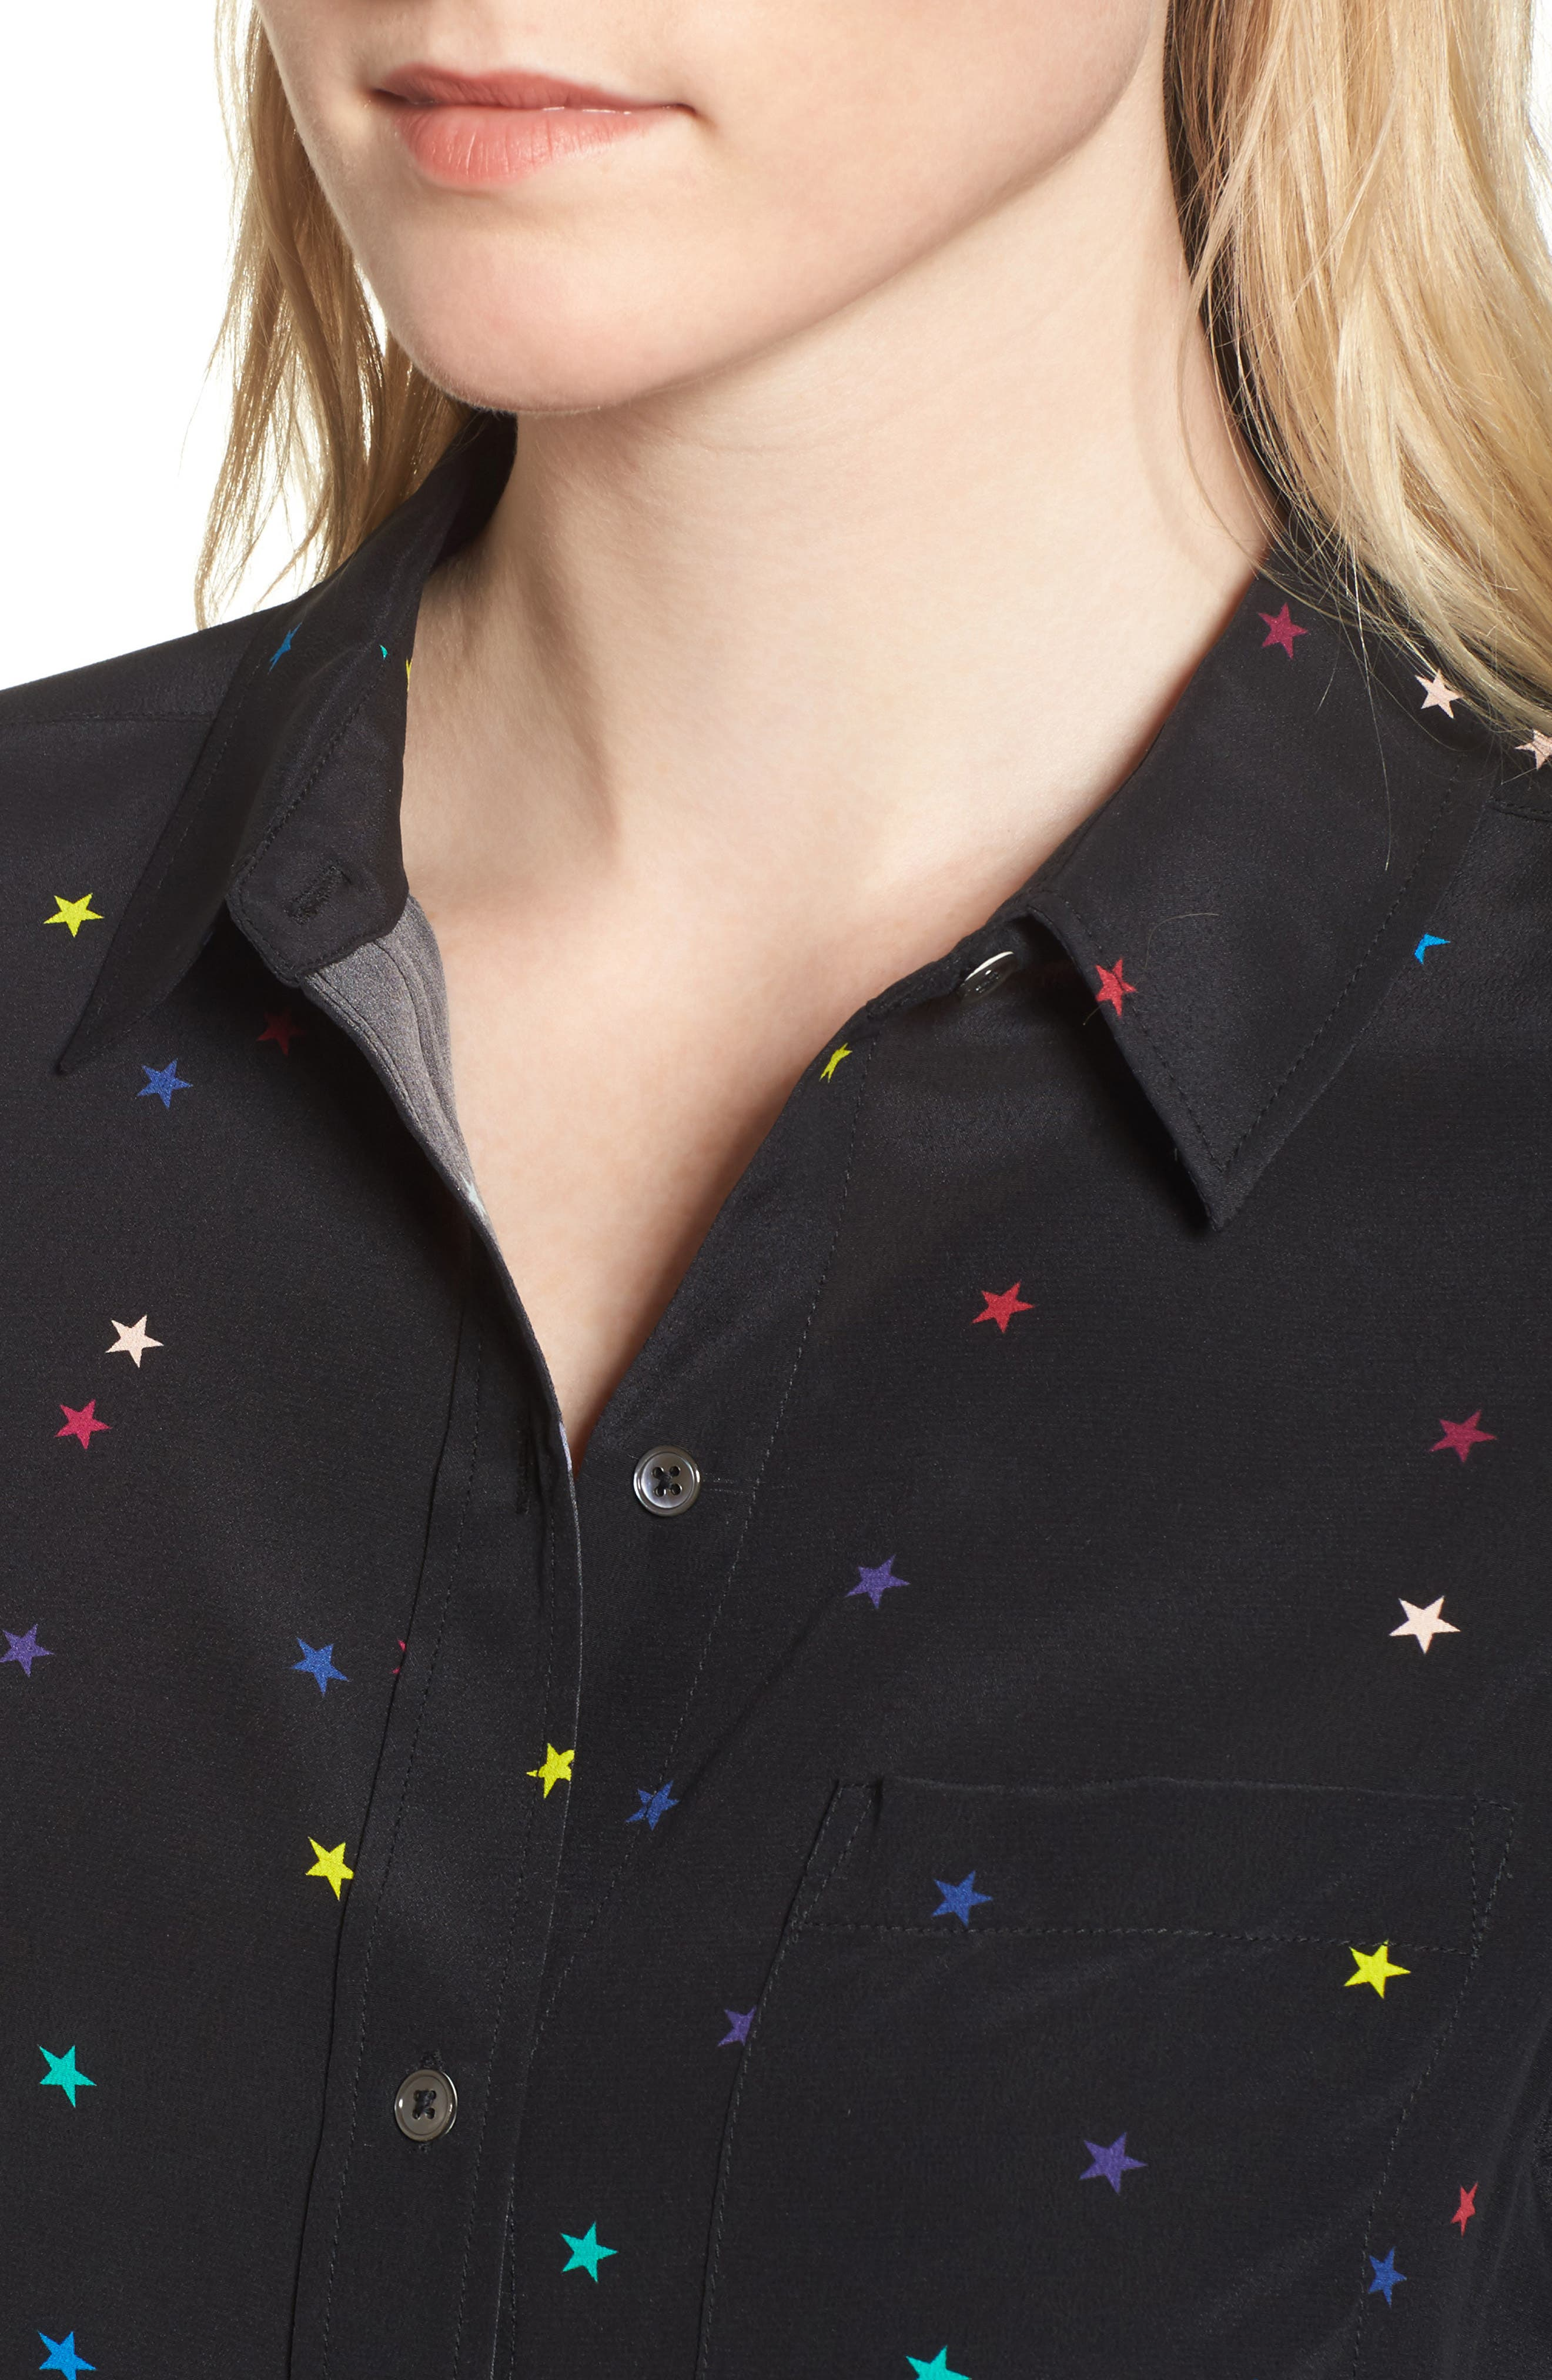 Kate Star Print Silk Blouse,                             Alternate thumbnail 4, color,                             Rainbow Stars/ Black